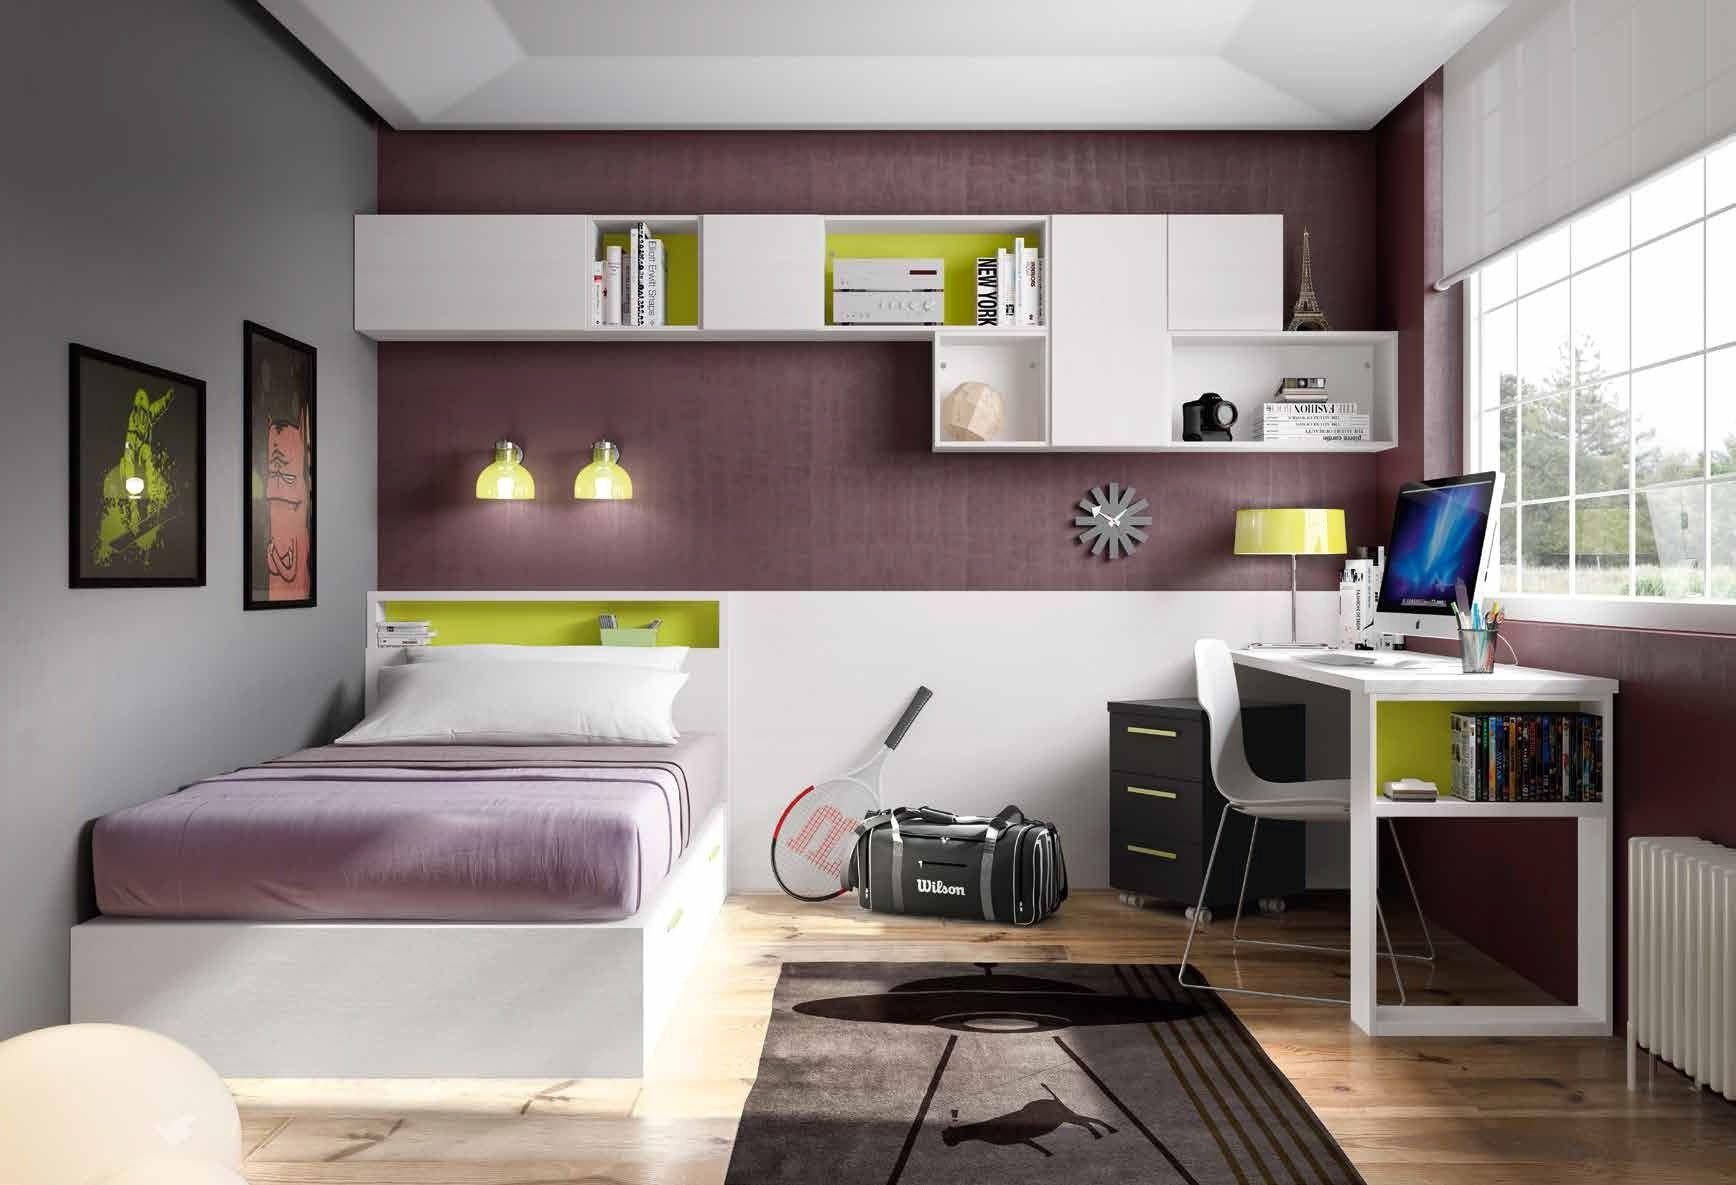 Habitaci n juvenil moderna moira habitaciones juveniles - Muebles dormitorio juvenil ...